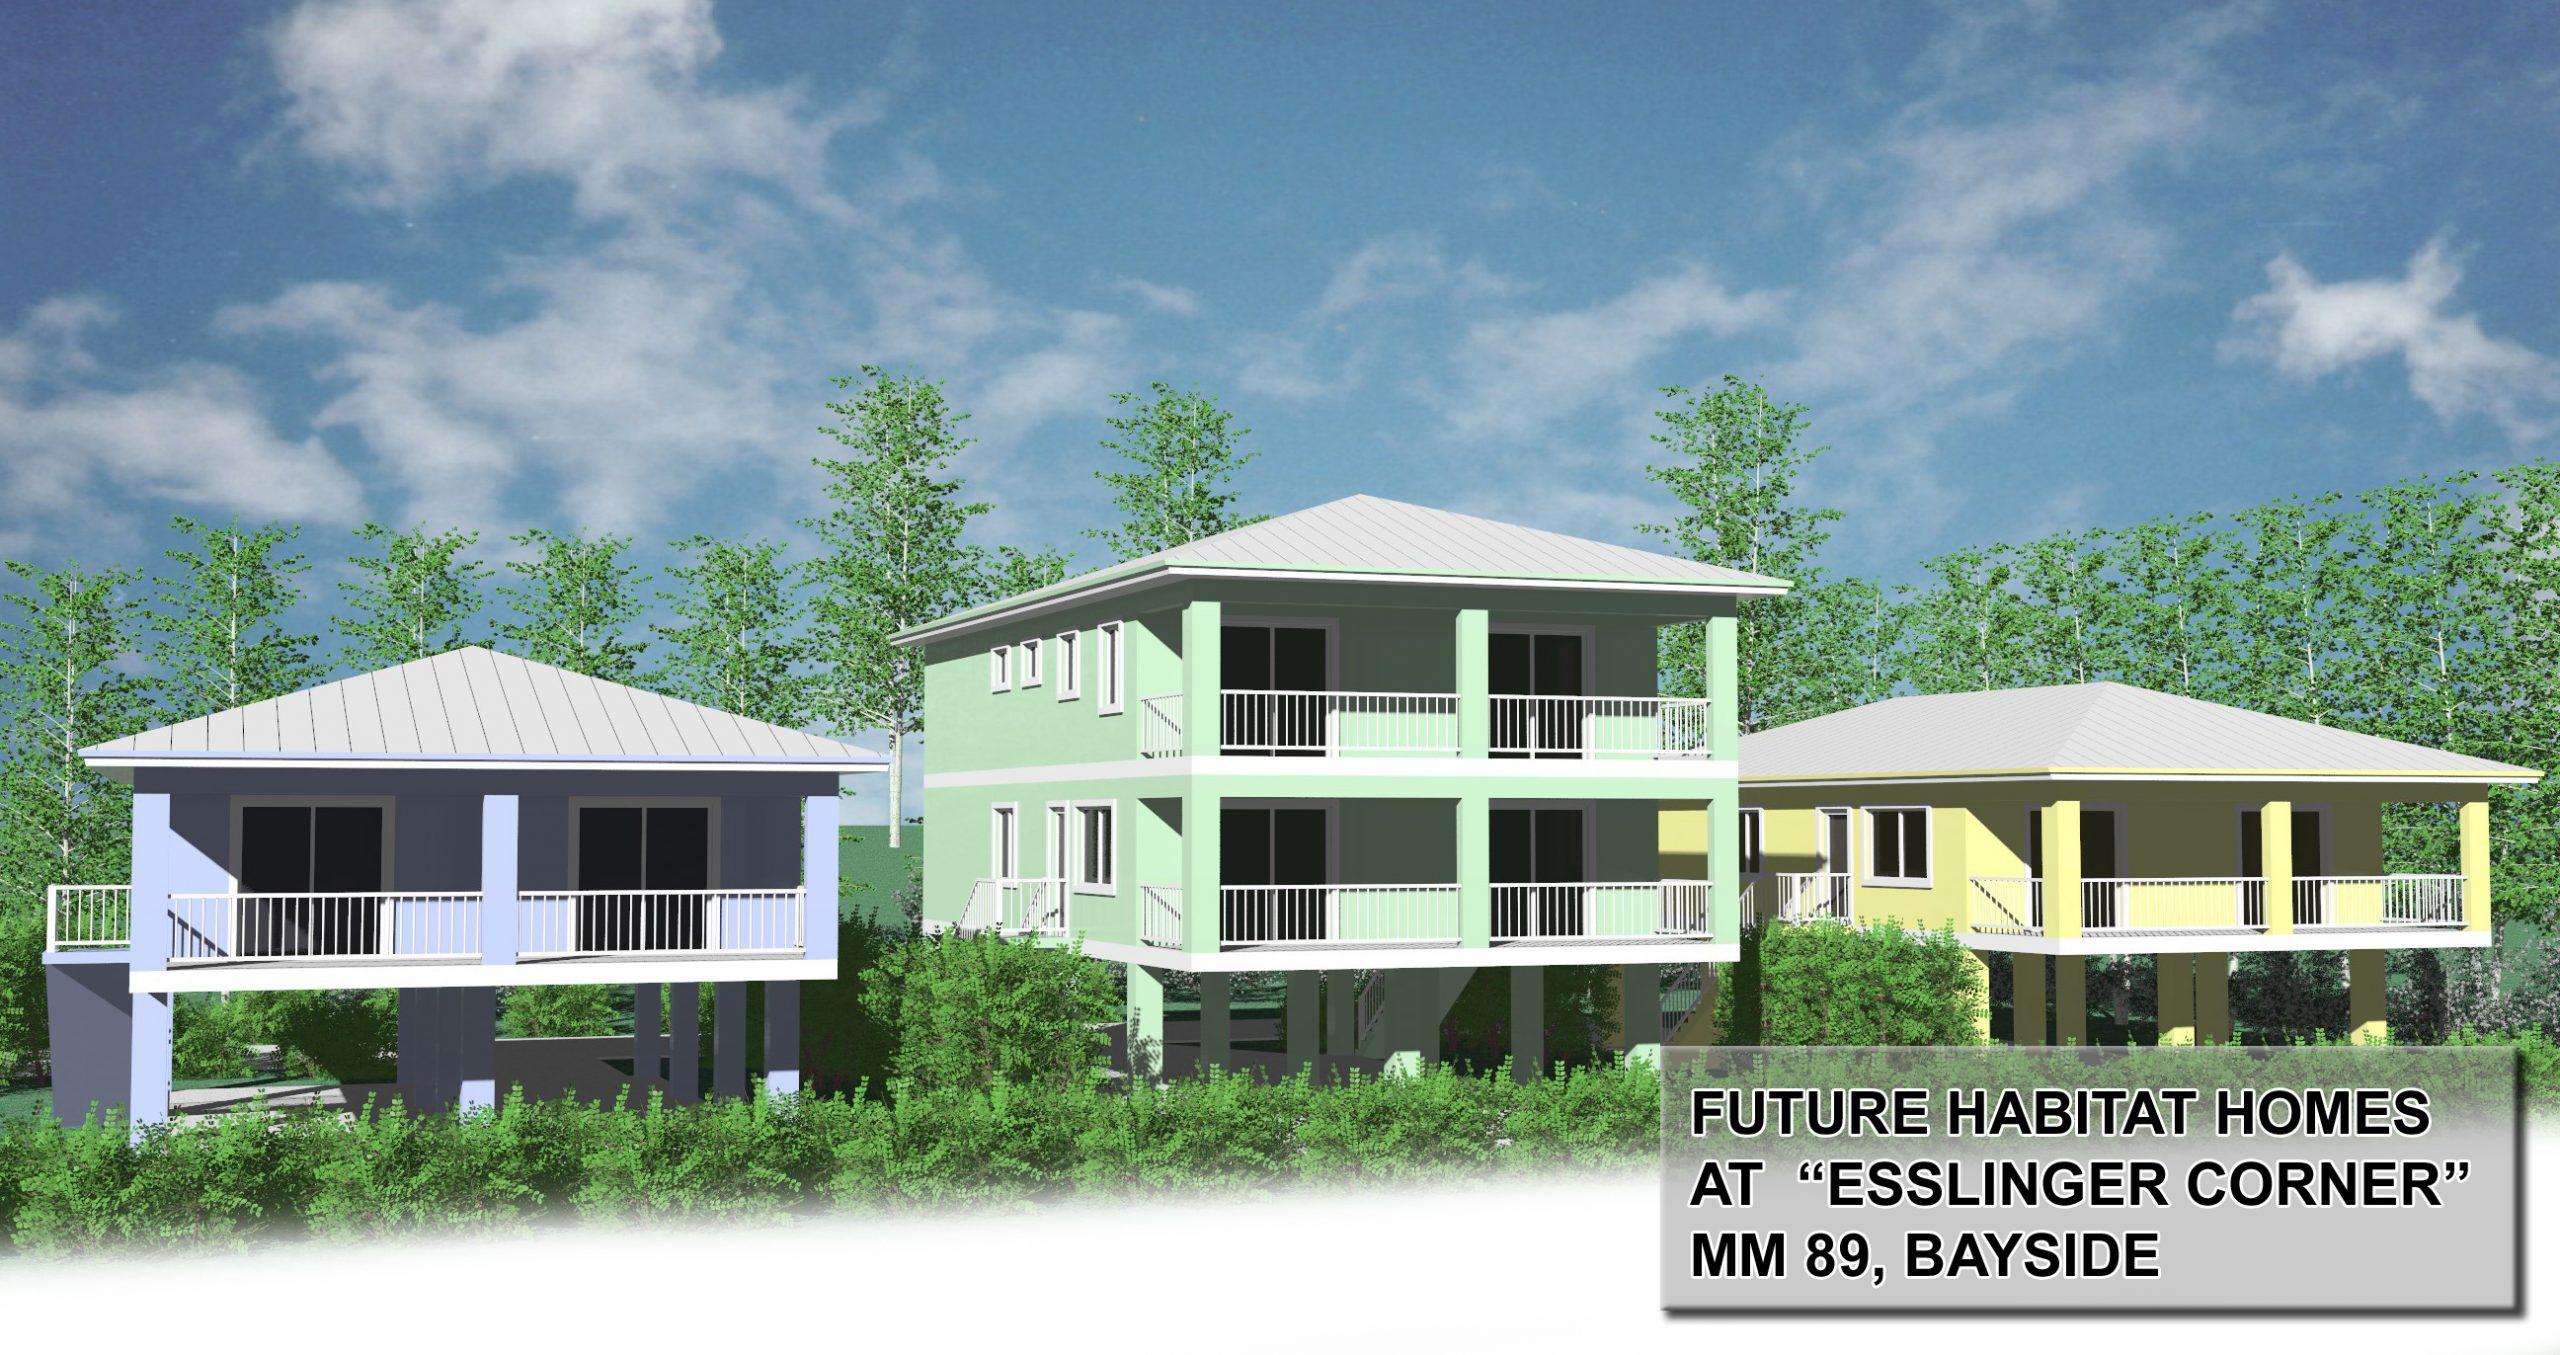 future homes rendering